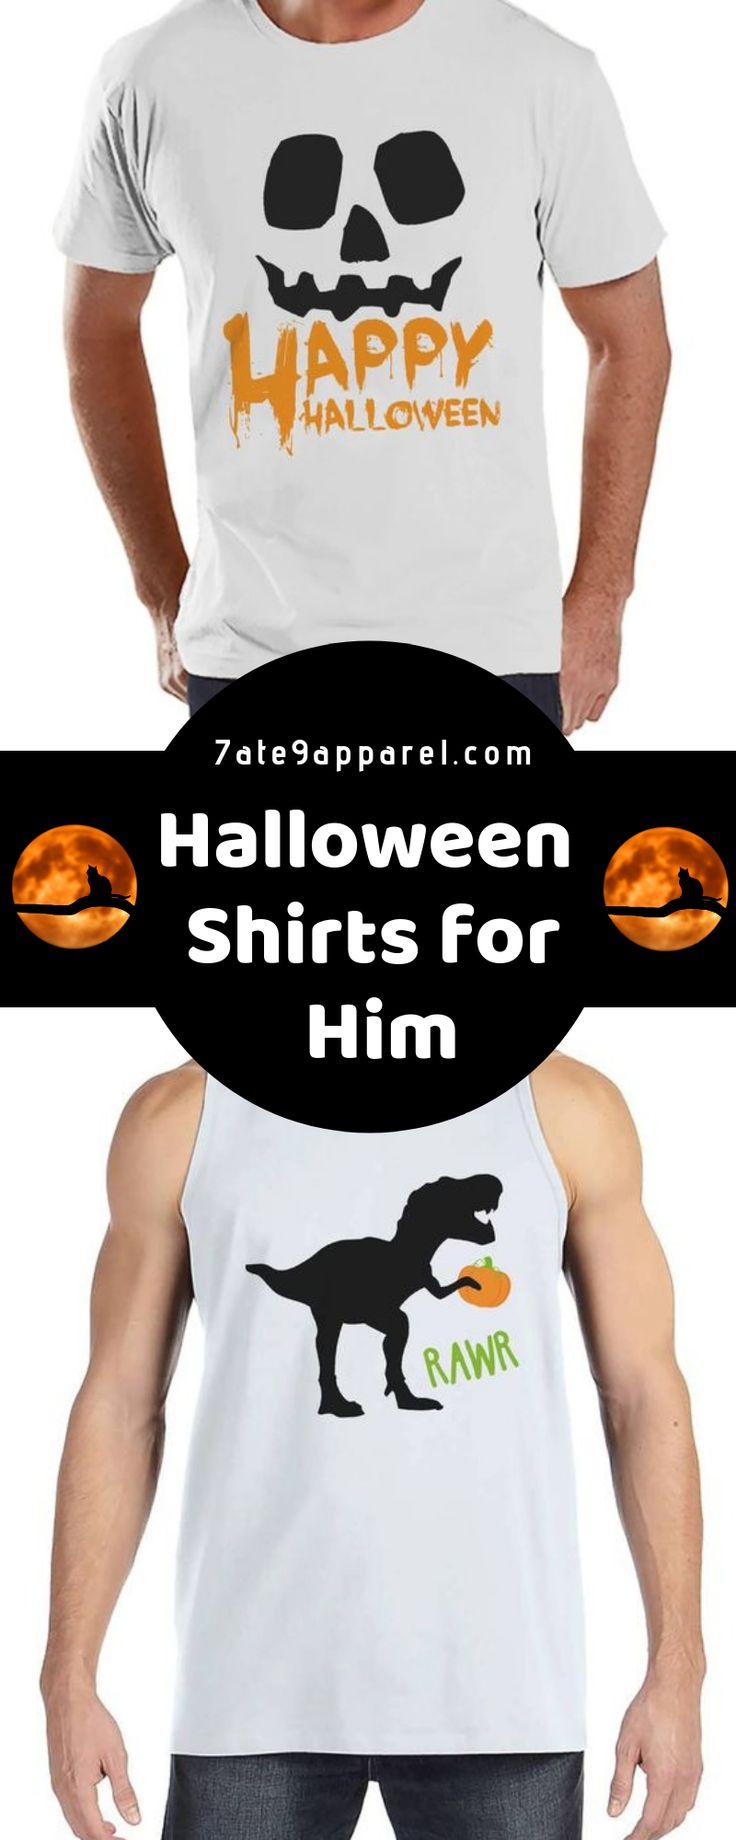 Halloween Shirts for Him